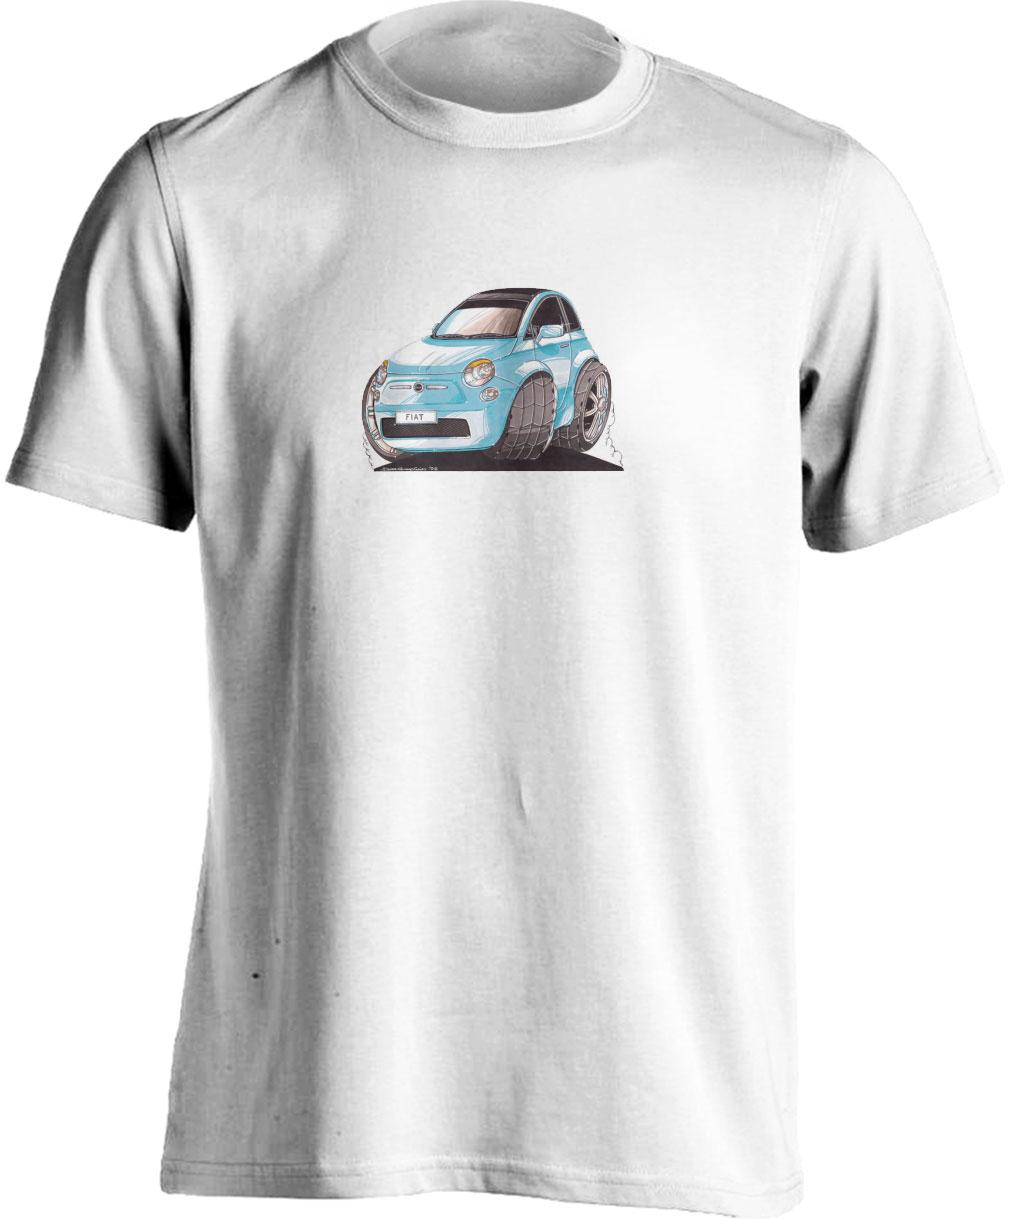 T Shirt 500 Koolart 2358